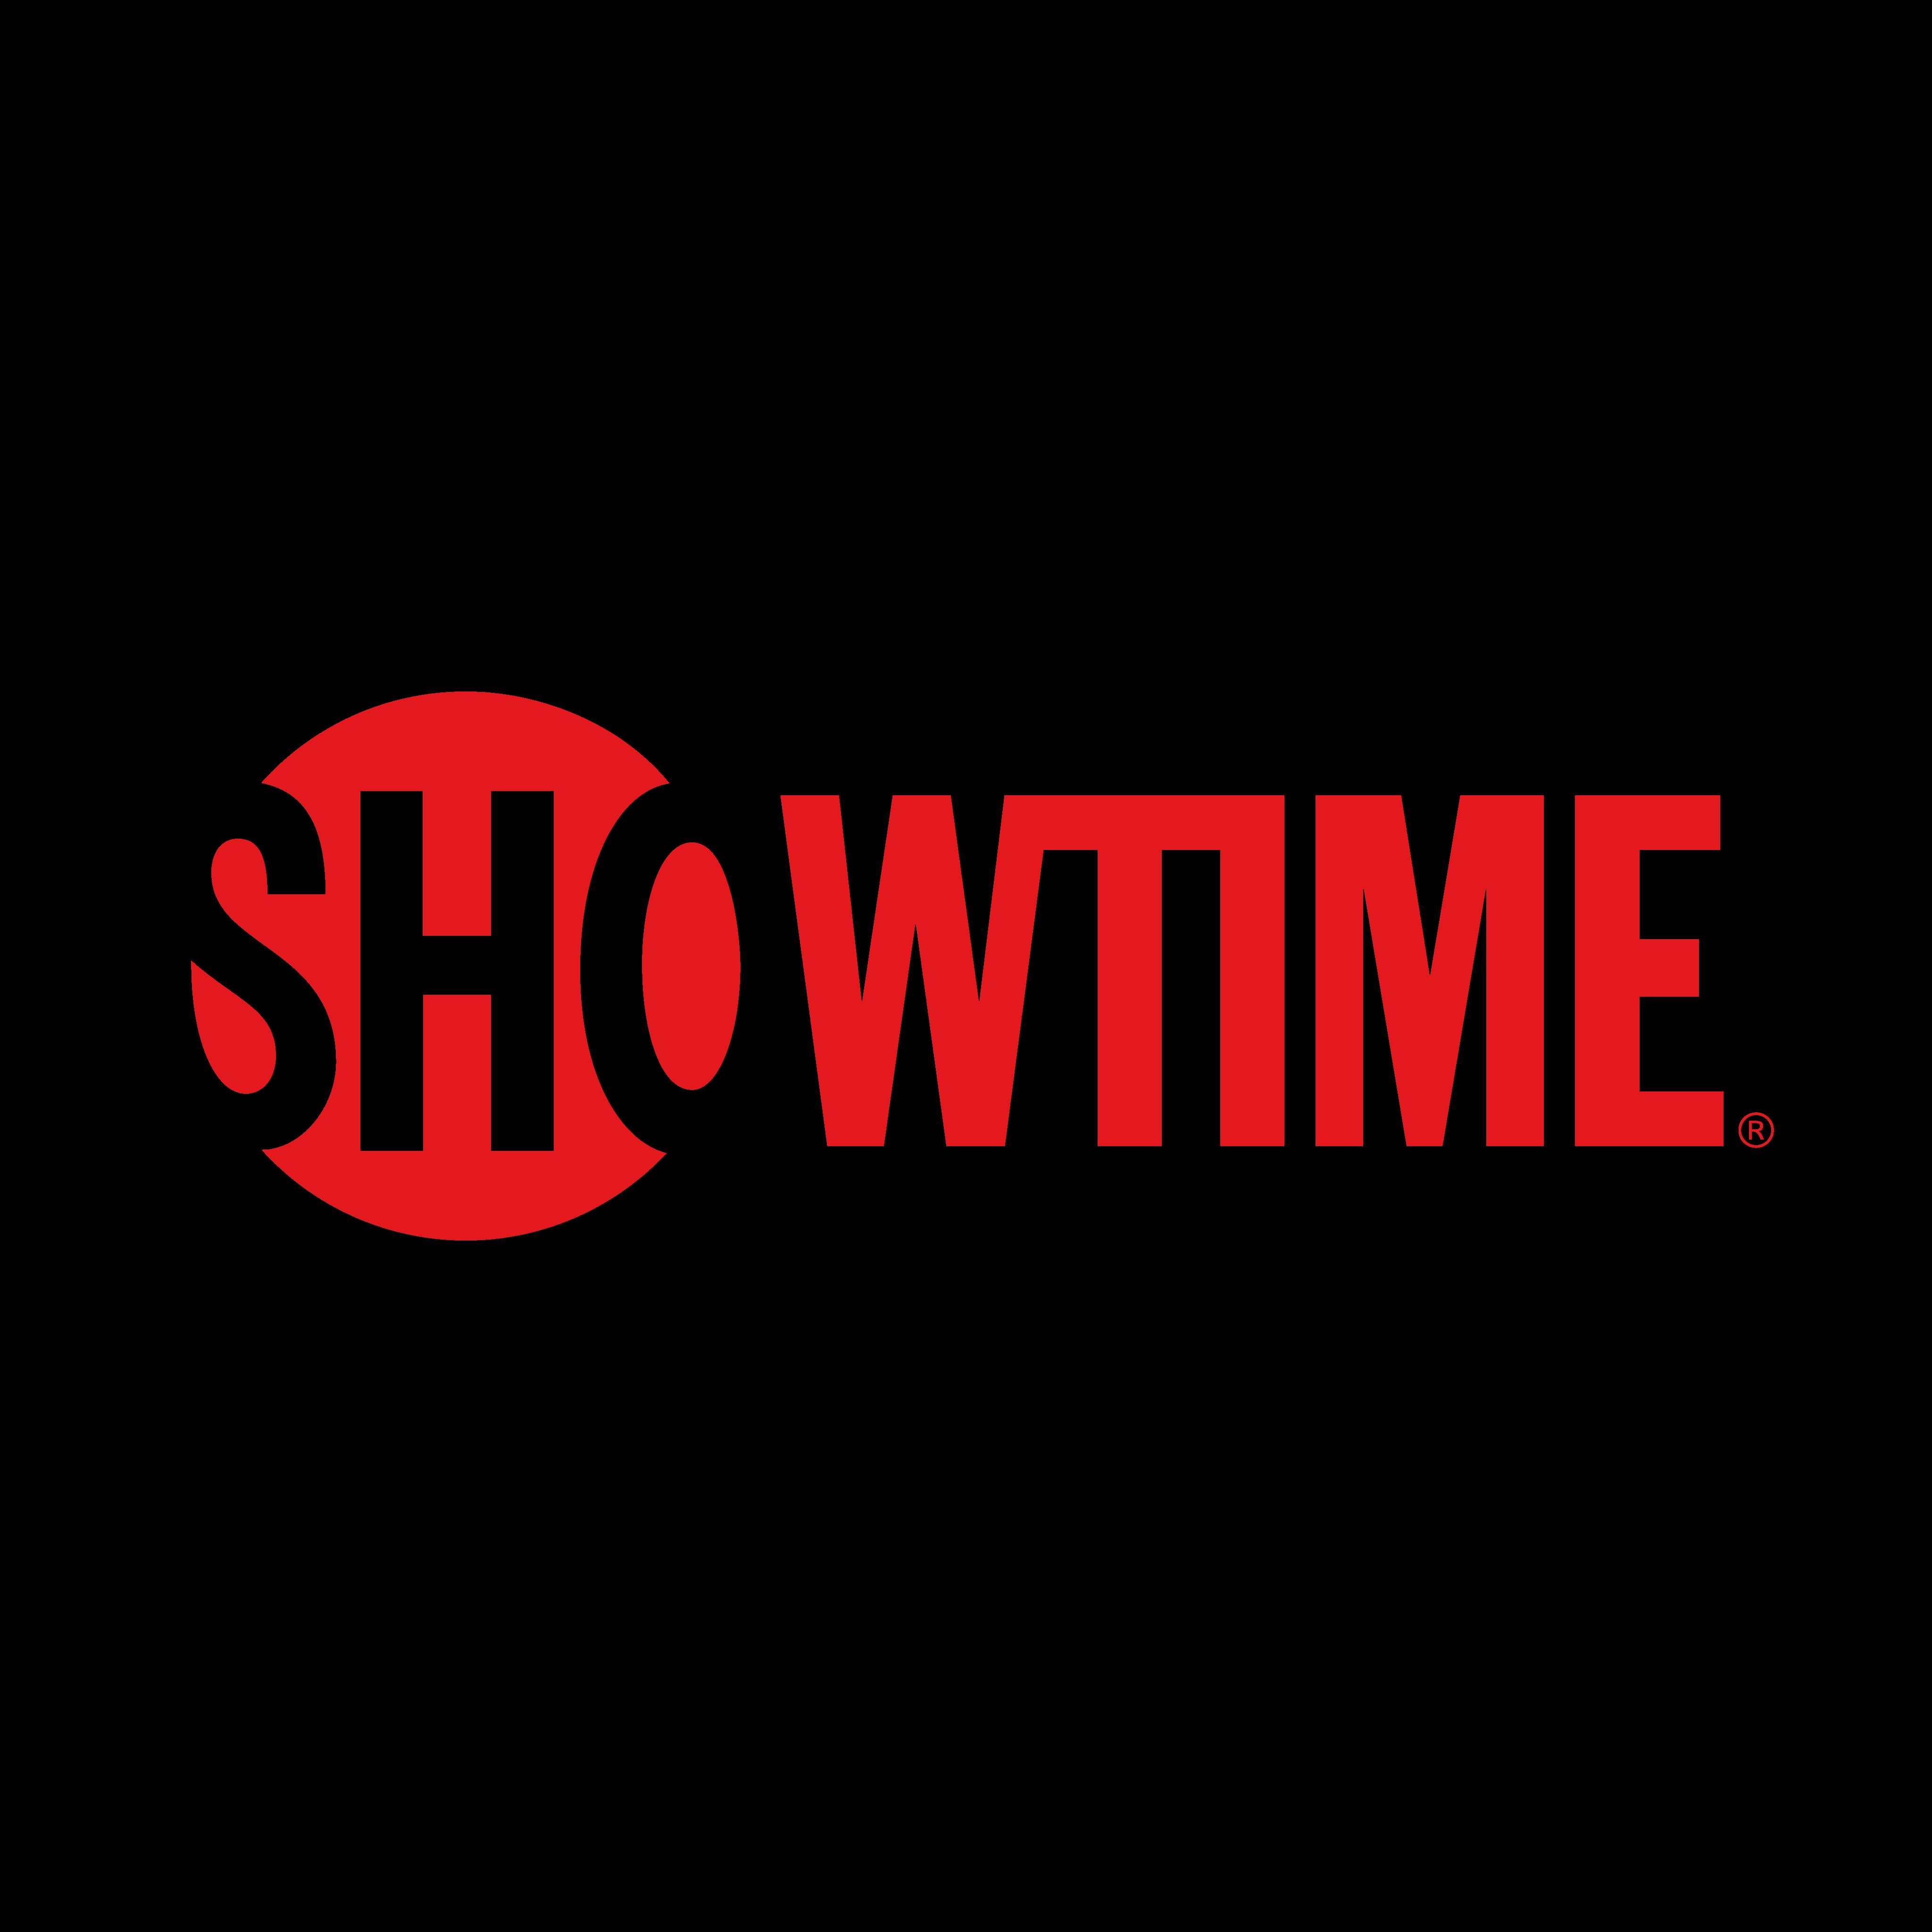 showtime logo 0 - SHOWTIME Logo